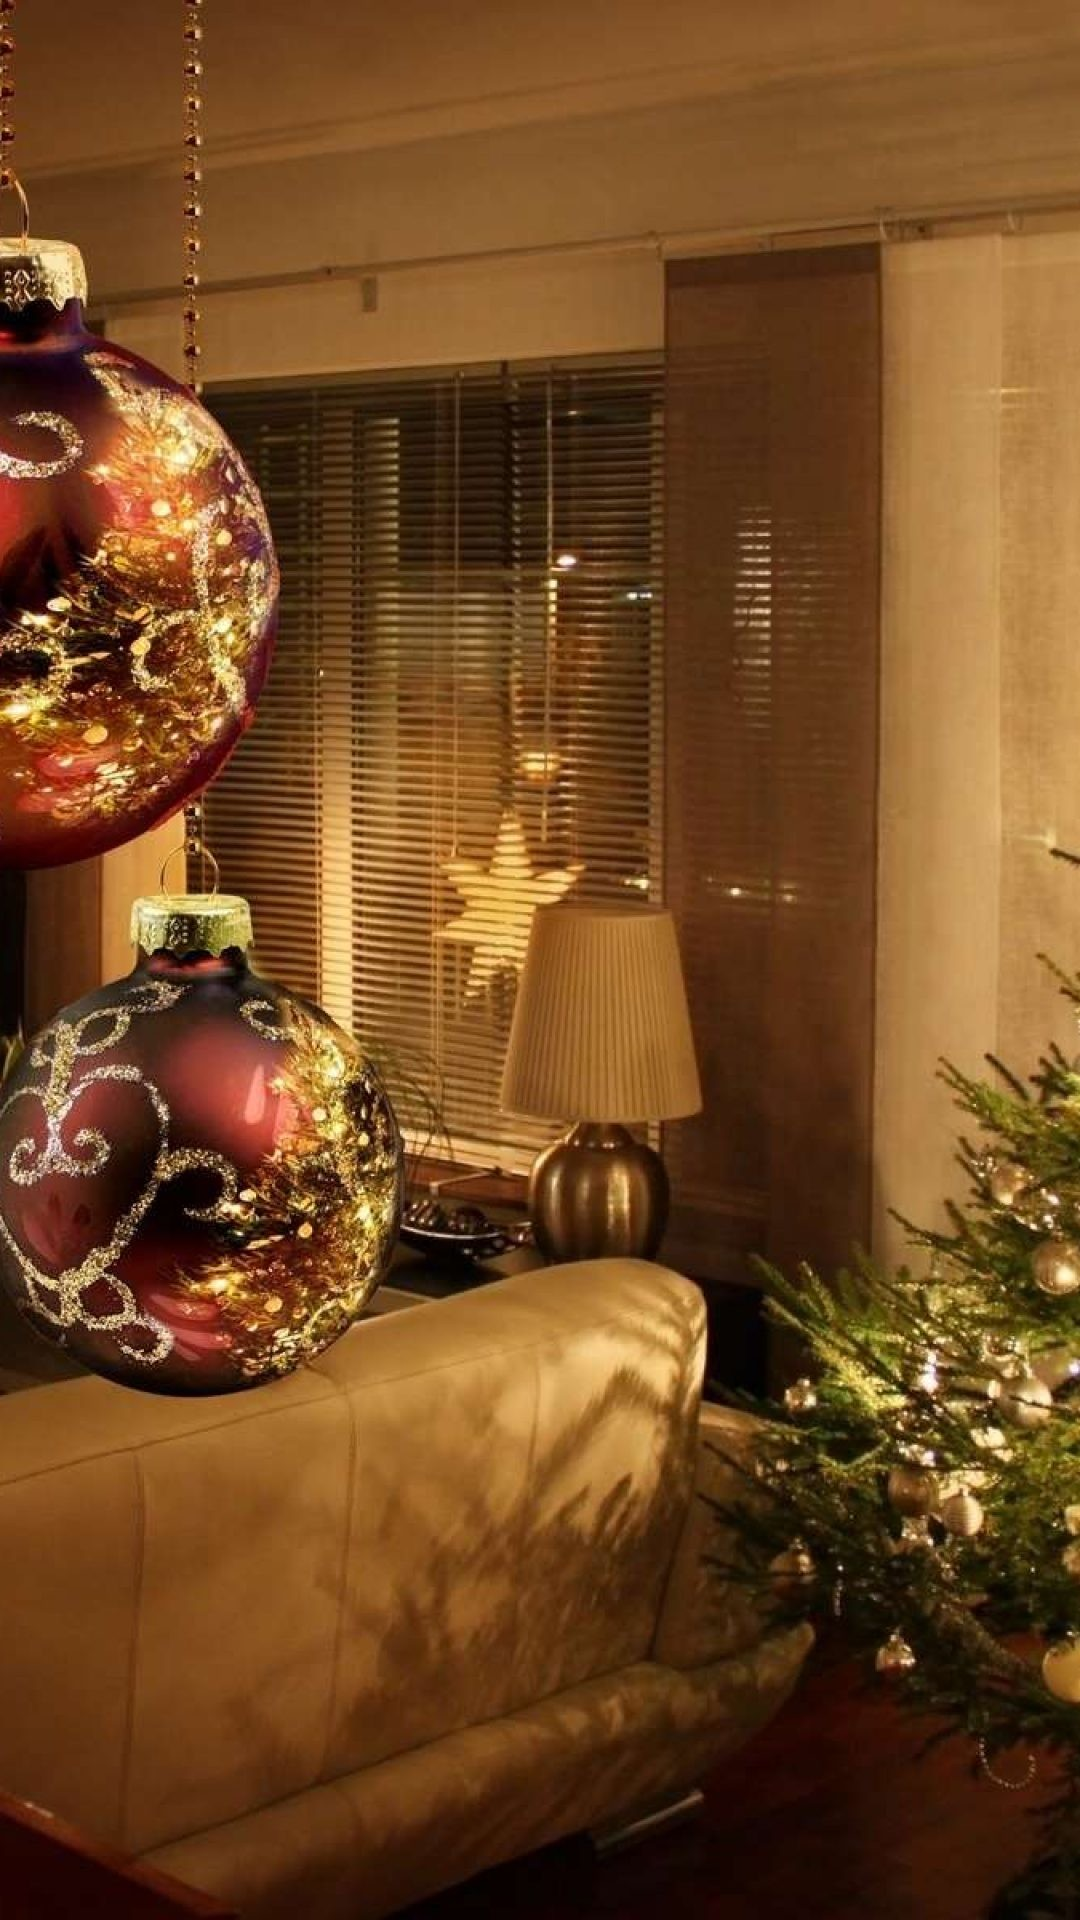 <b>Hd Christmas Desktop</b> Backgrounds – WallpaperSafari